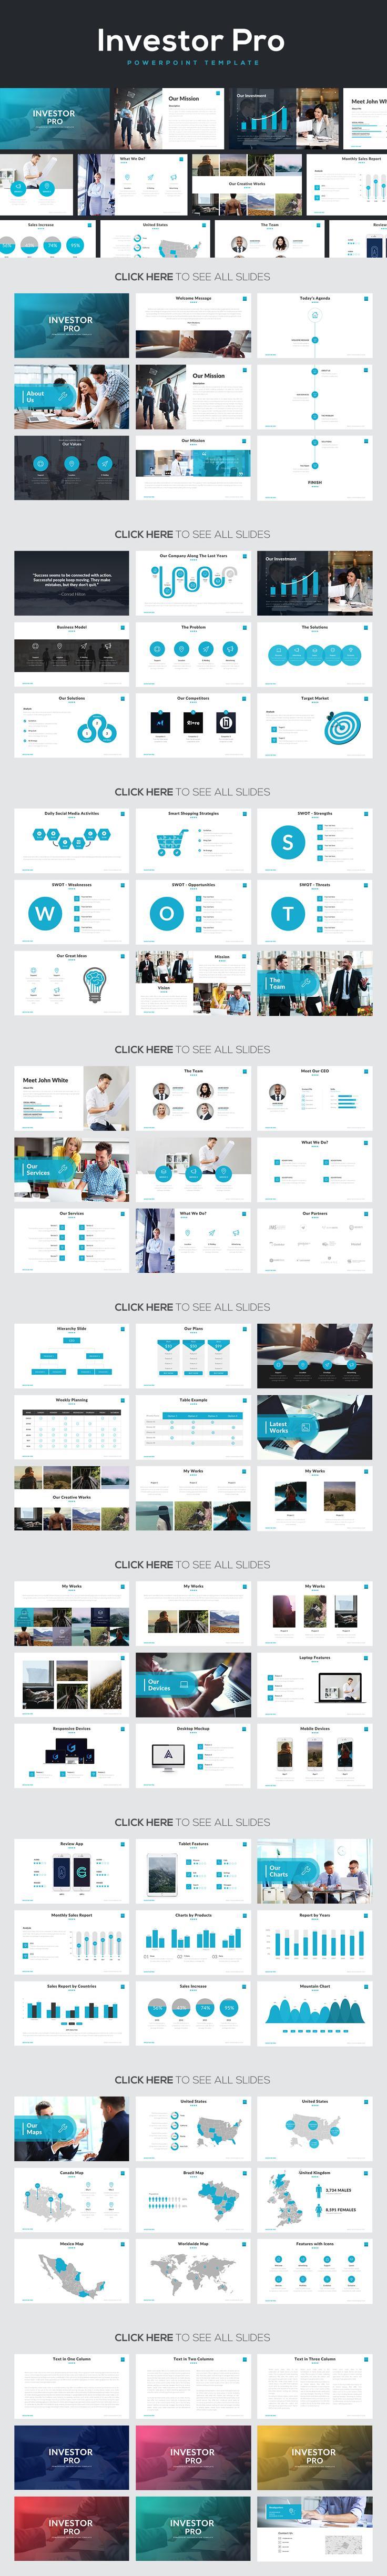 investor pro powerpoint template | pinterest | presentation, Powerpoint Template Investor Presentation, Presentation templates